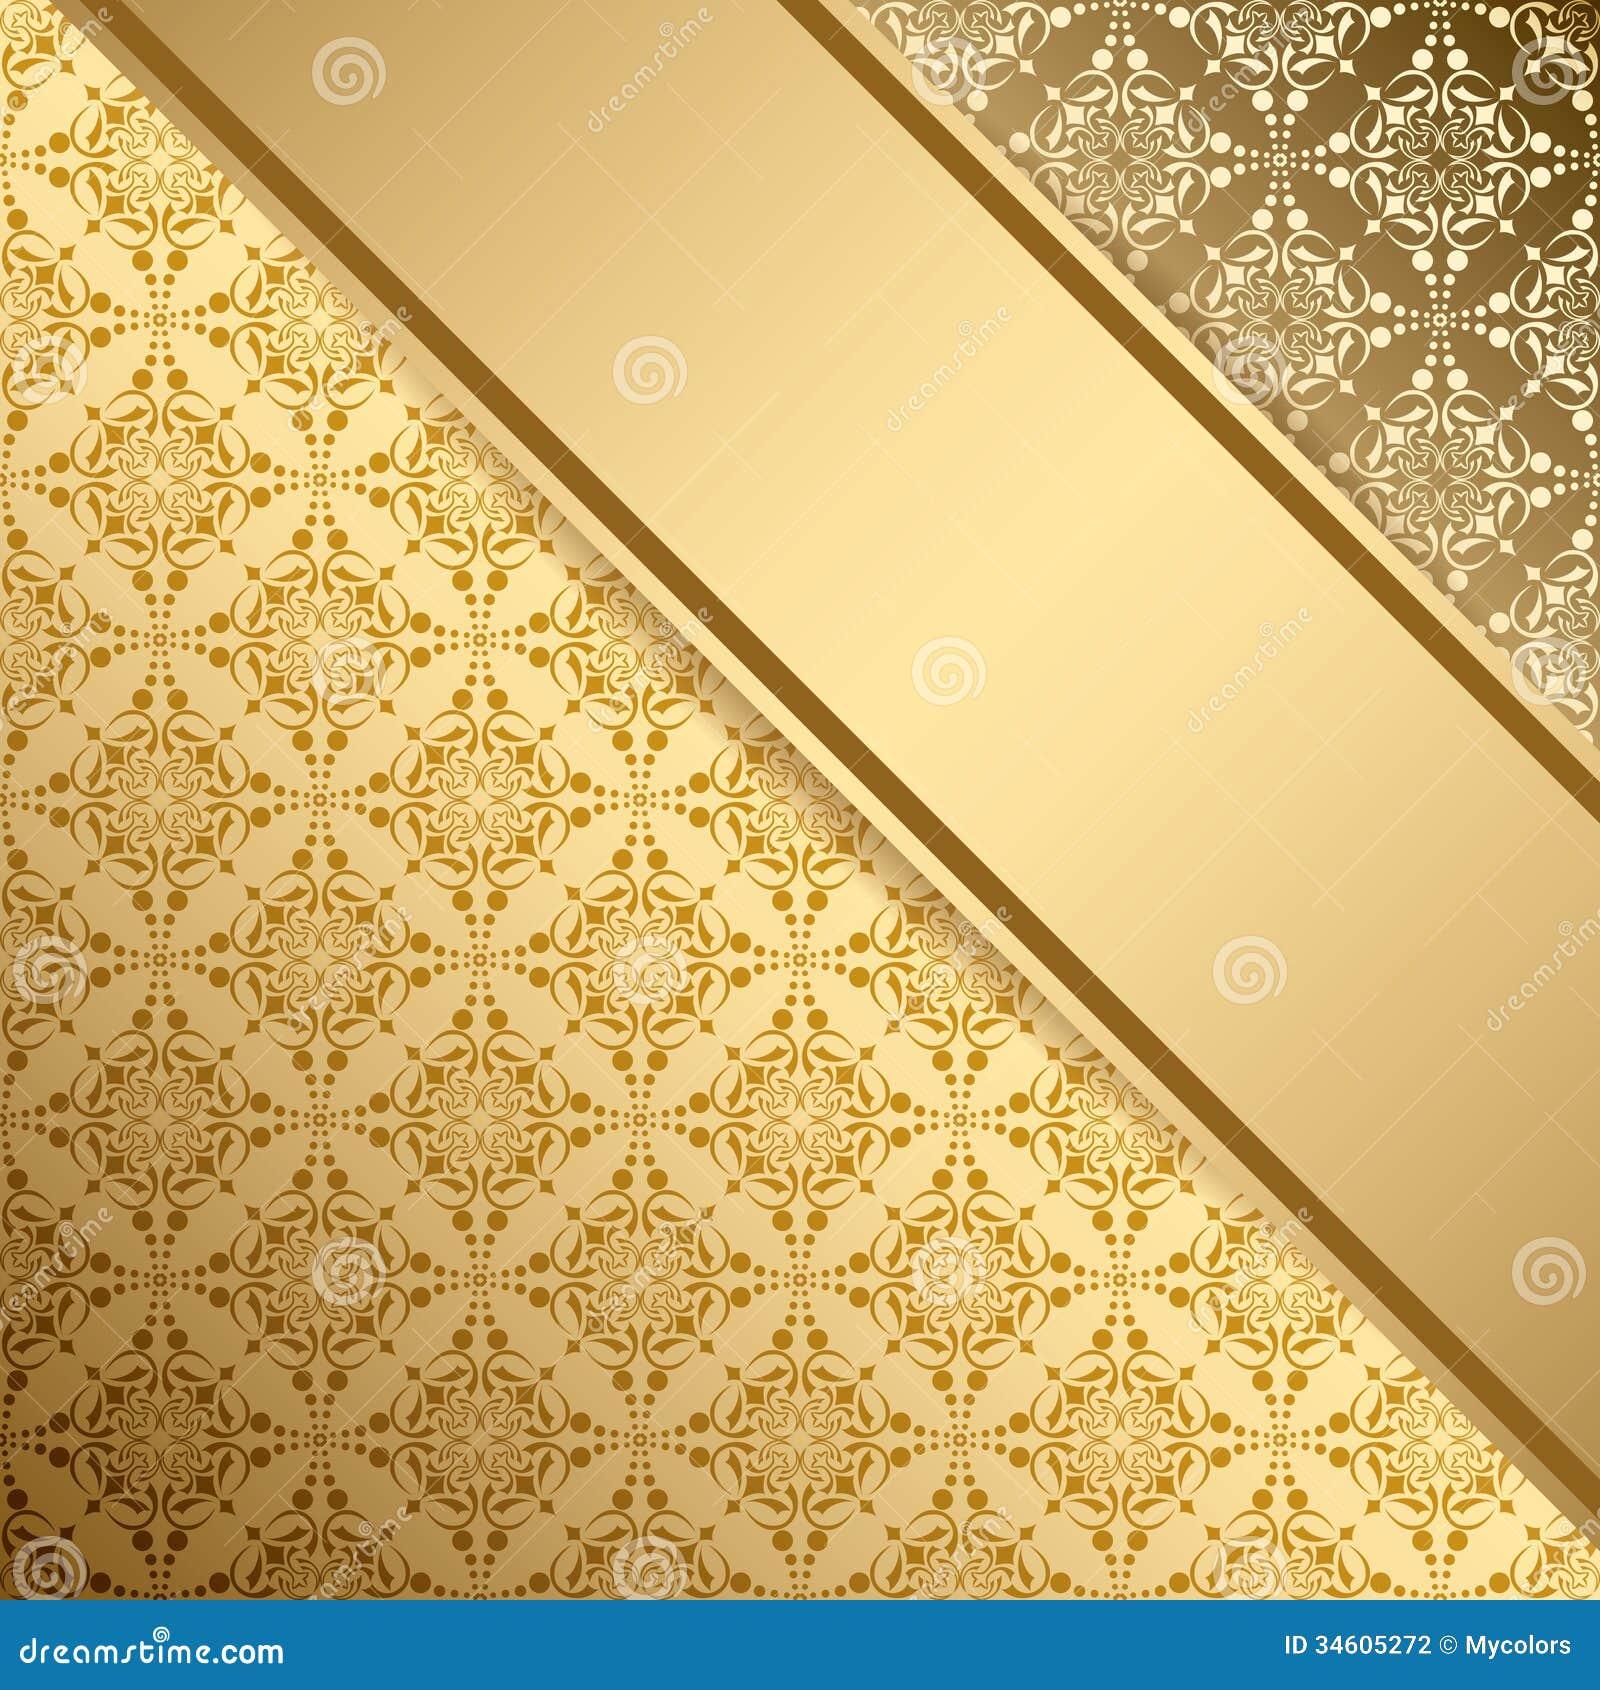 Golden Vector Vintage Background With Gradient Stock